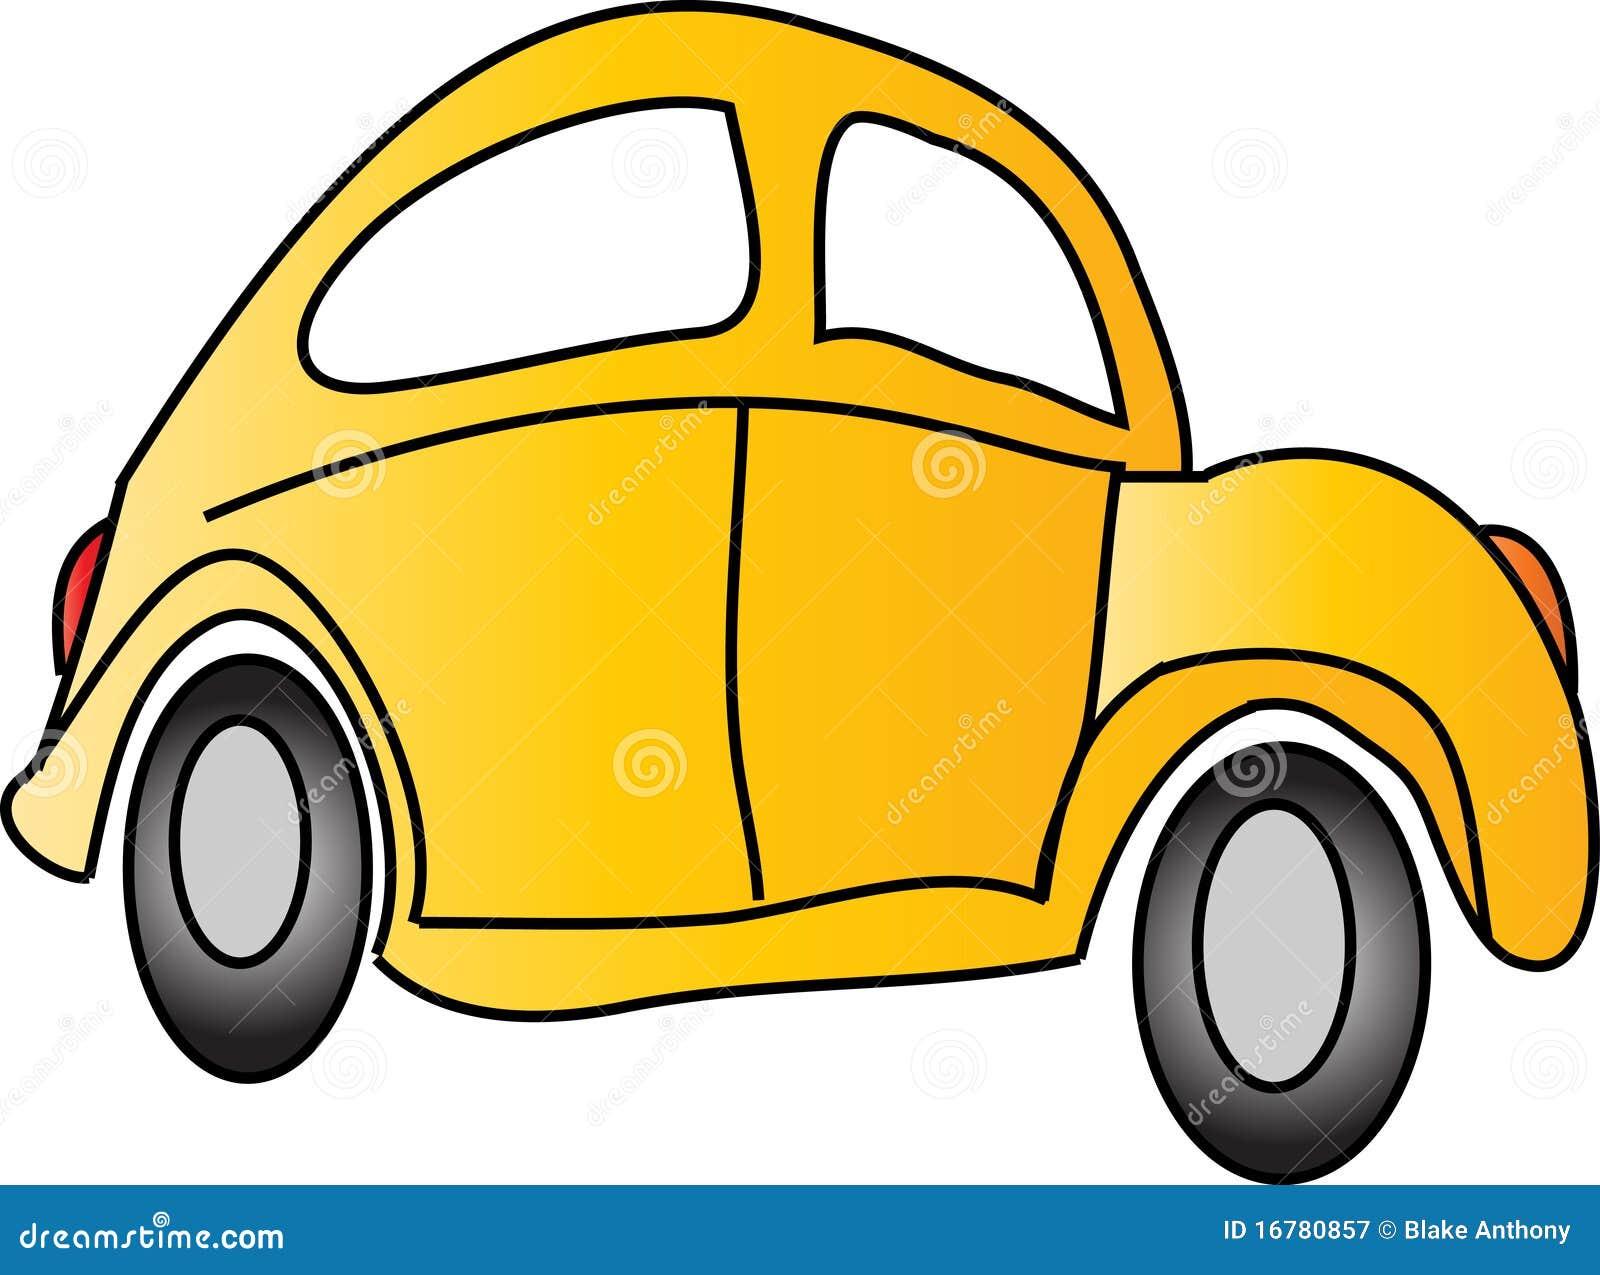 Cartoon Taxi Royalty Free Stock Photography - Image: 16780857: dreamstime.com/royalty-free-stock-photography-cartoon-taxi...